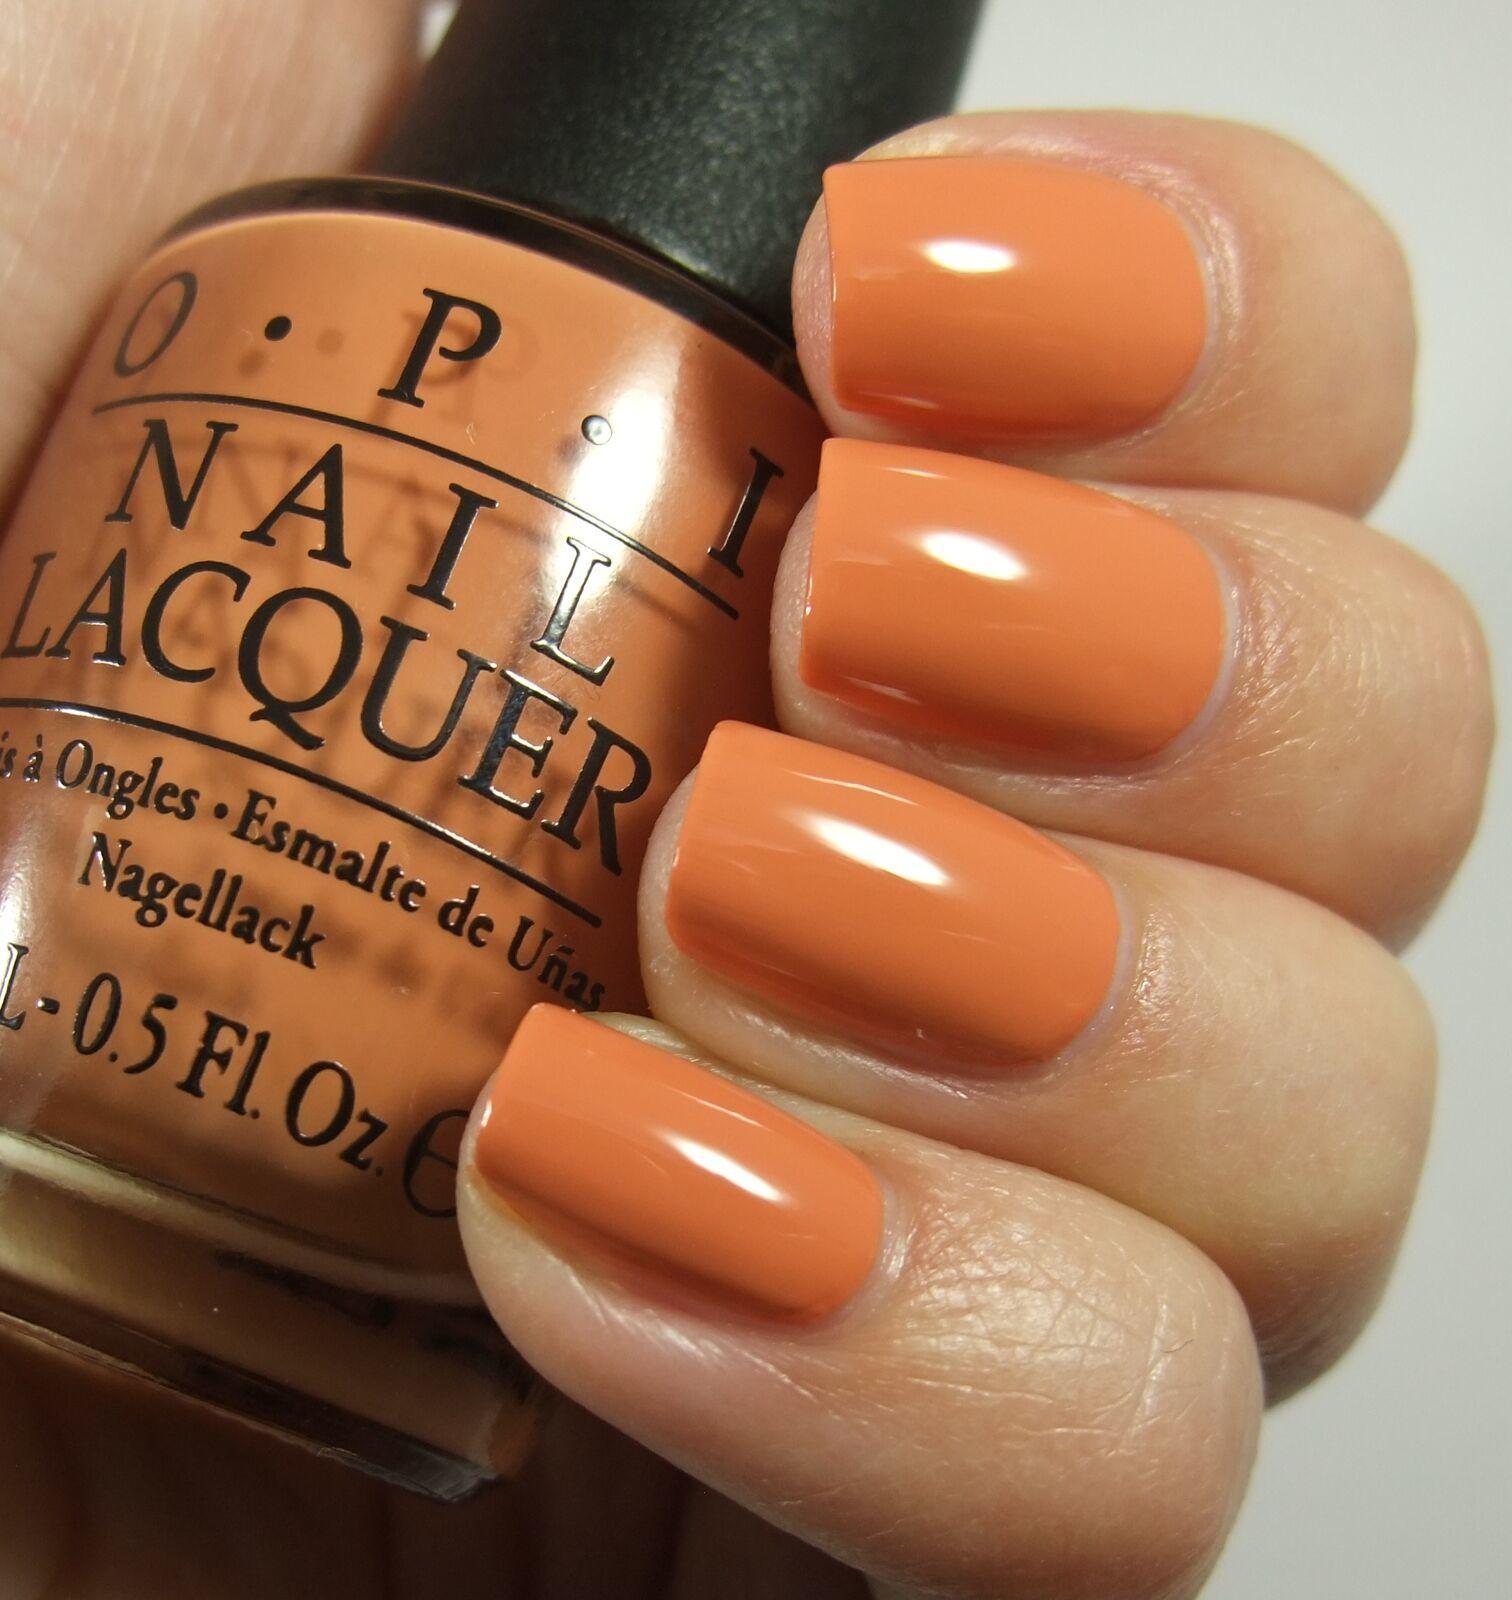 OPI Washington FREEDOM OF PEACH Orange Peach Creme Nail Polish Lacquer W59 .5oz!